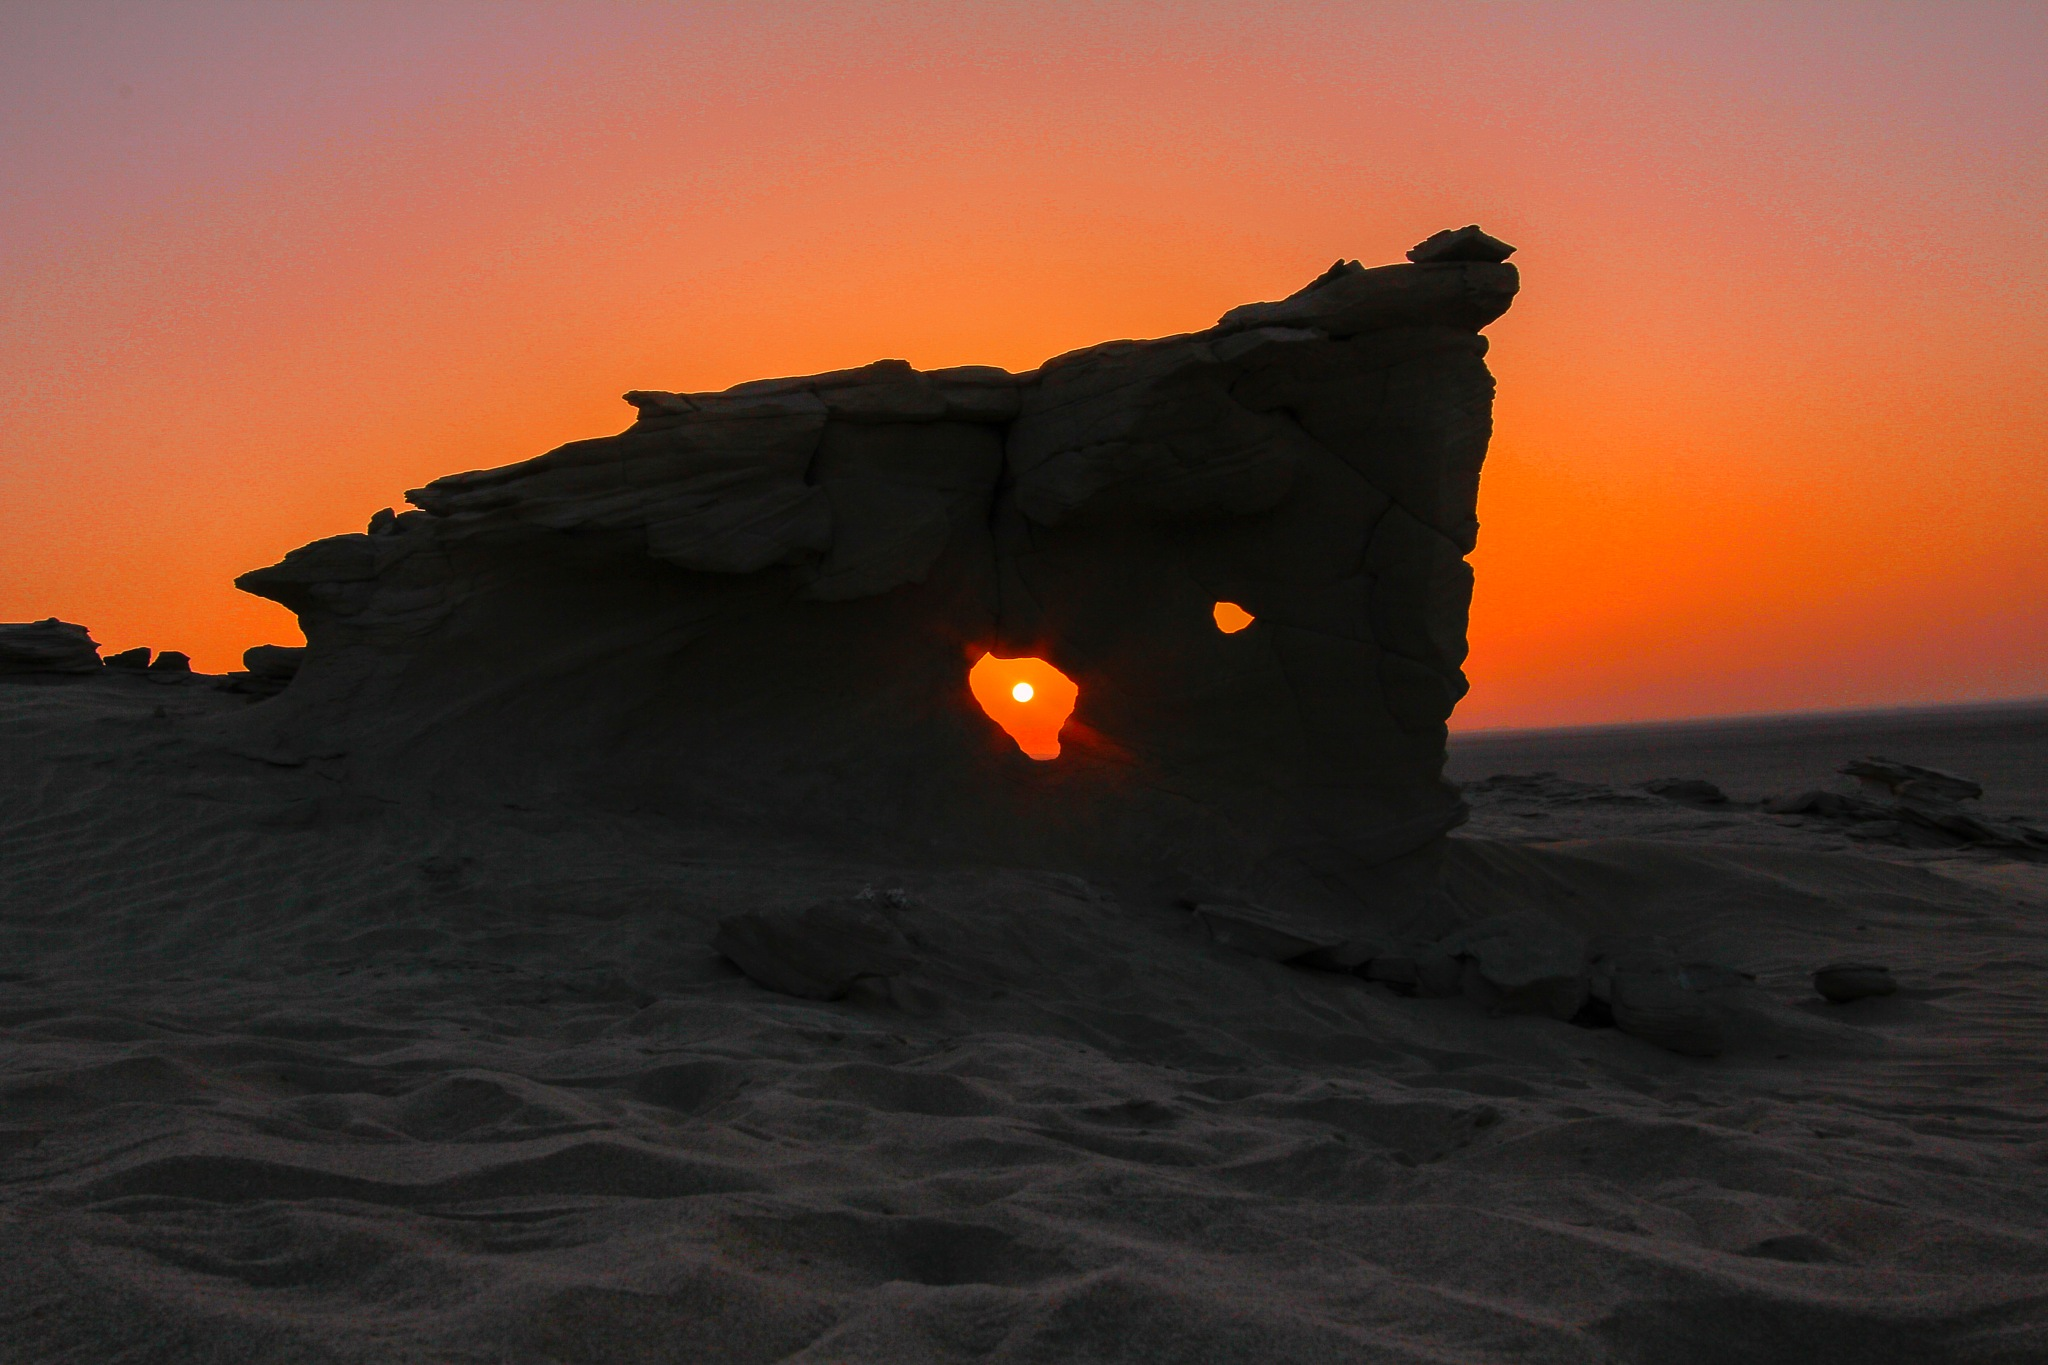 GOLDEN HOUR in AL WATHBA by pauljohnramos11